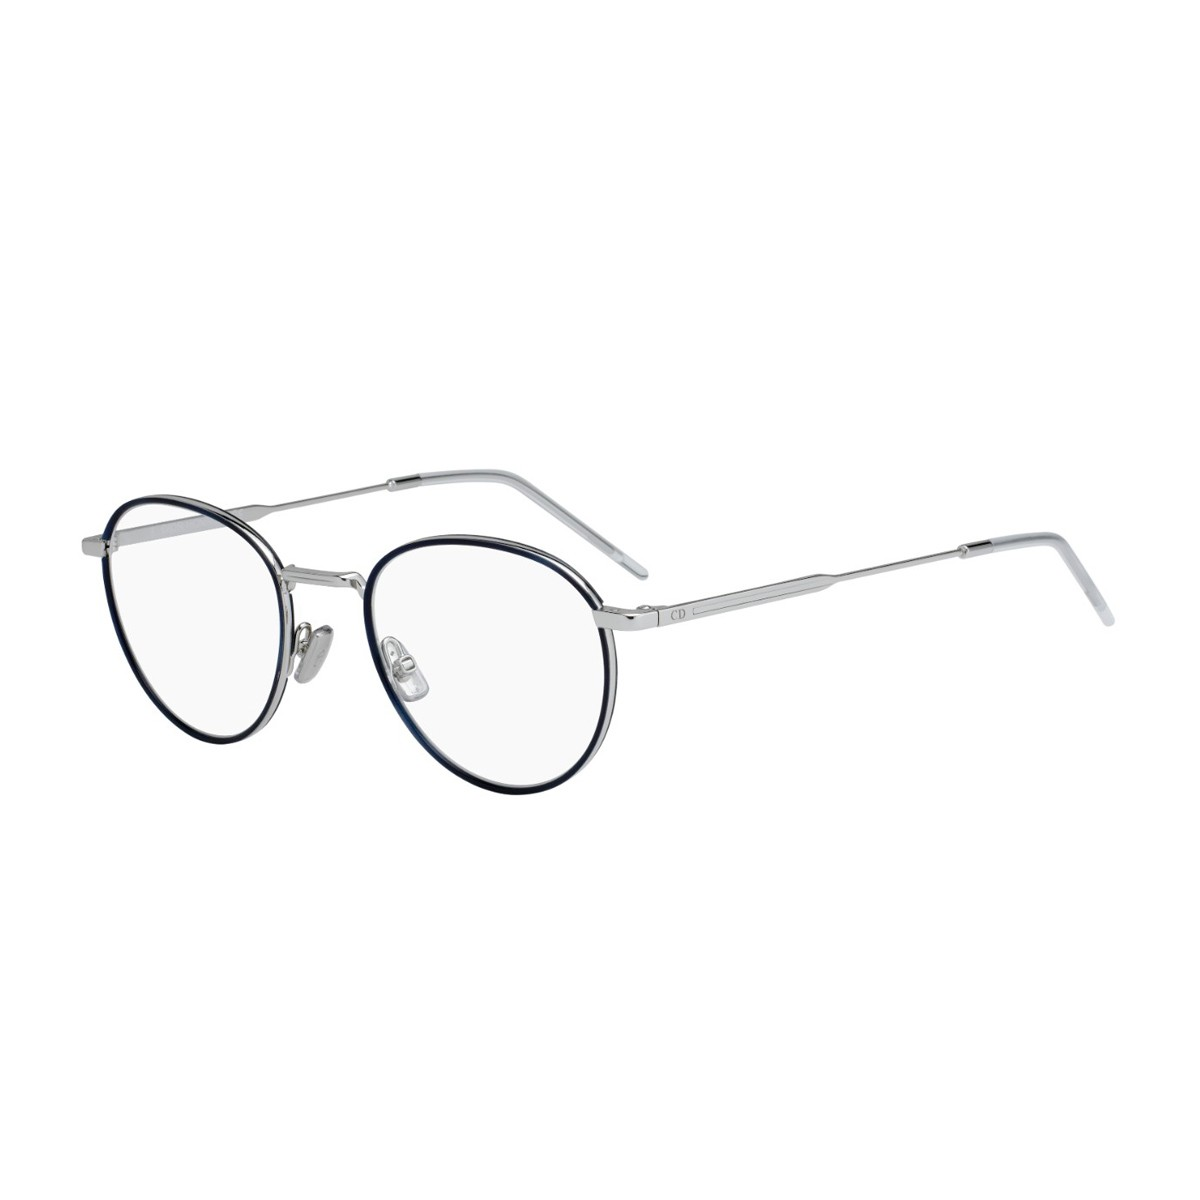 Dior 0213 | Occhiali da Vista